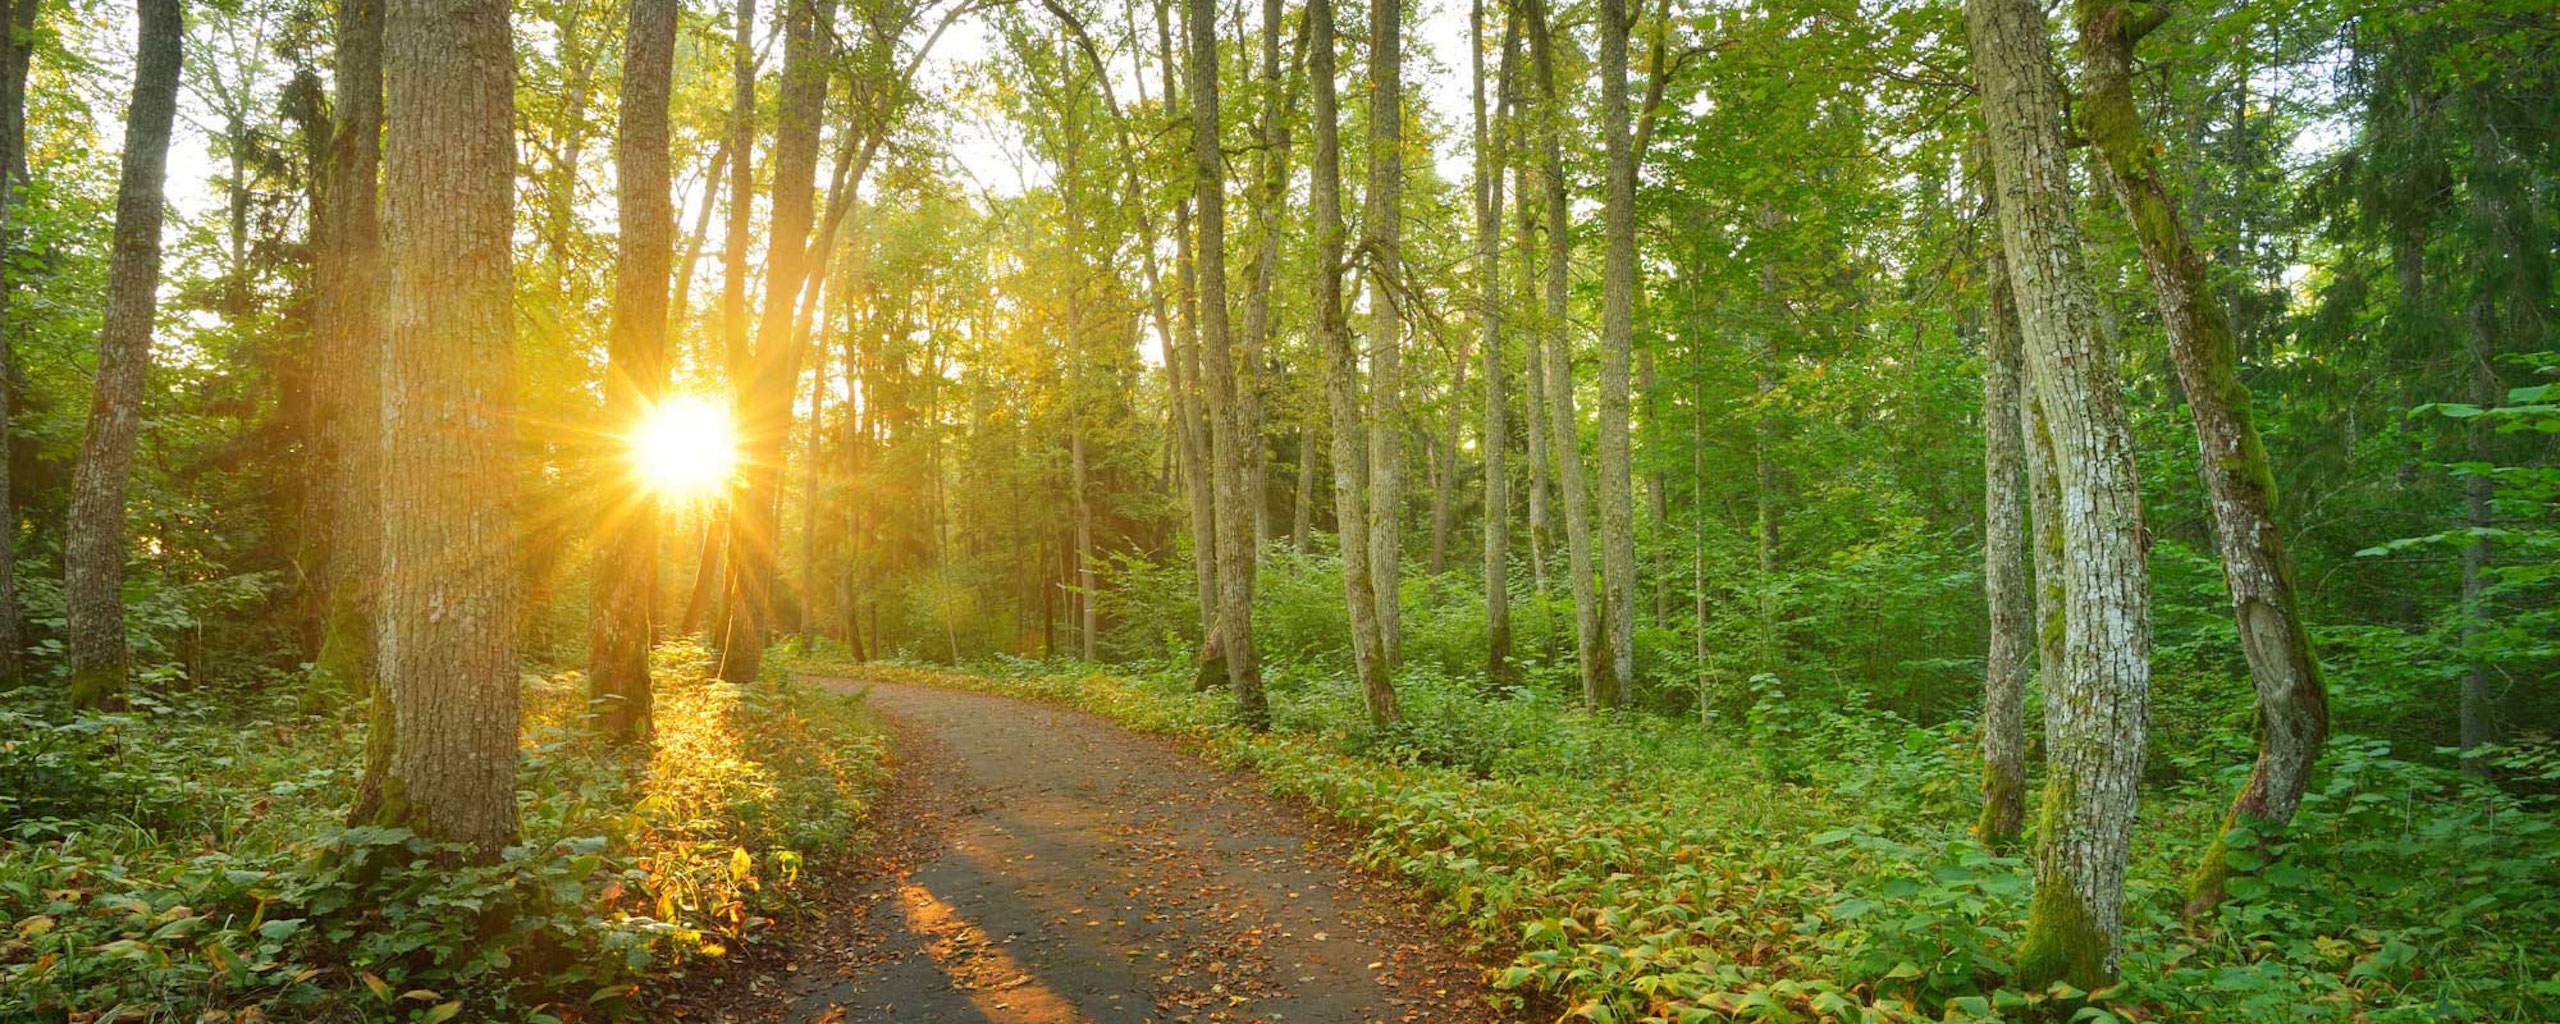 slider-woods-path-sm